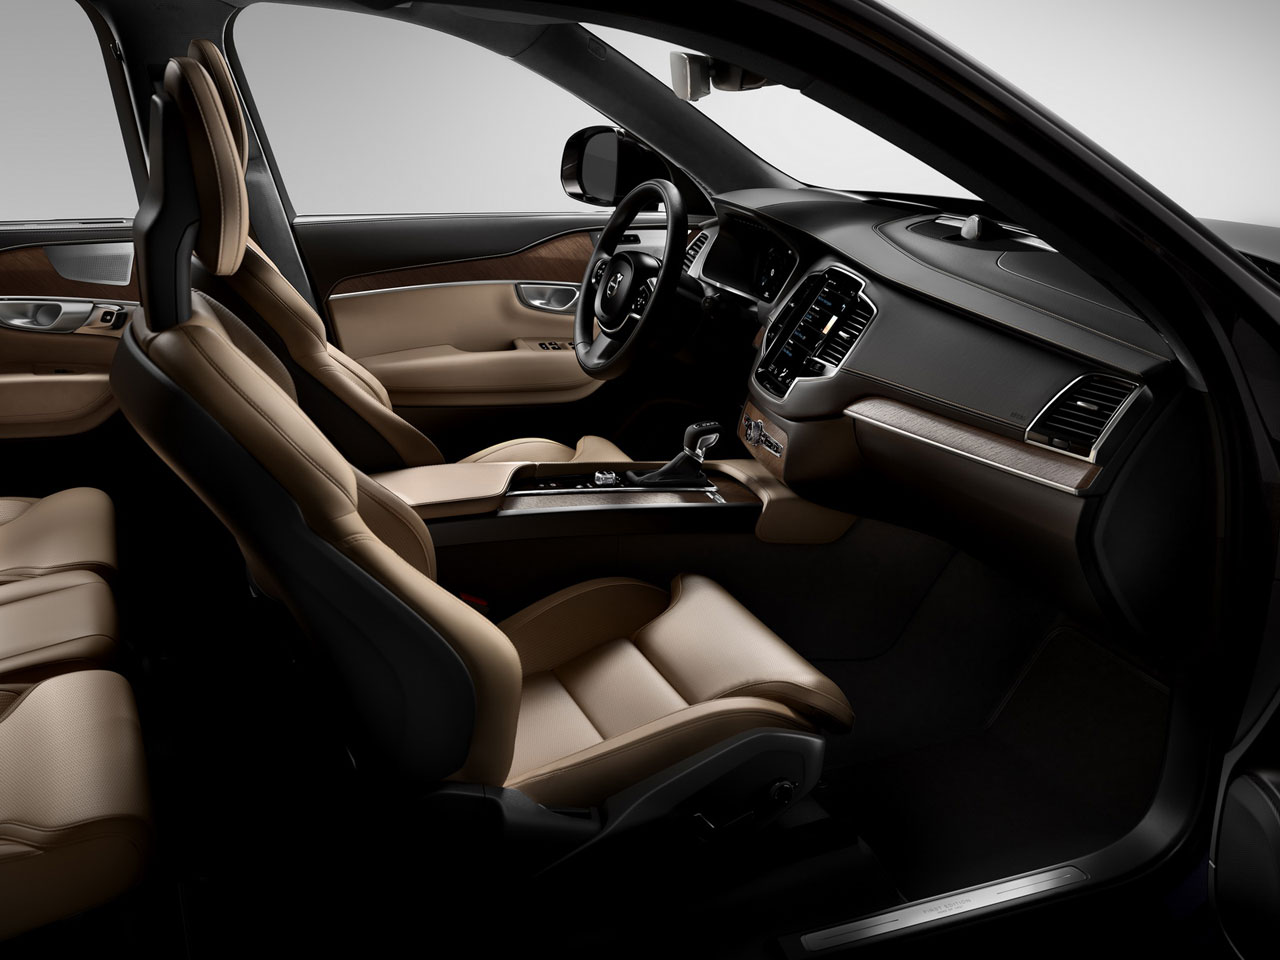 Volvo XC90 Interior - Car Body Design